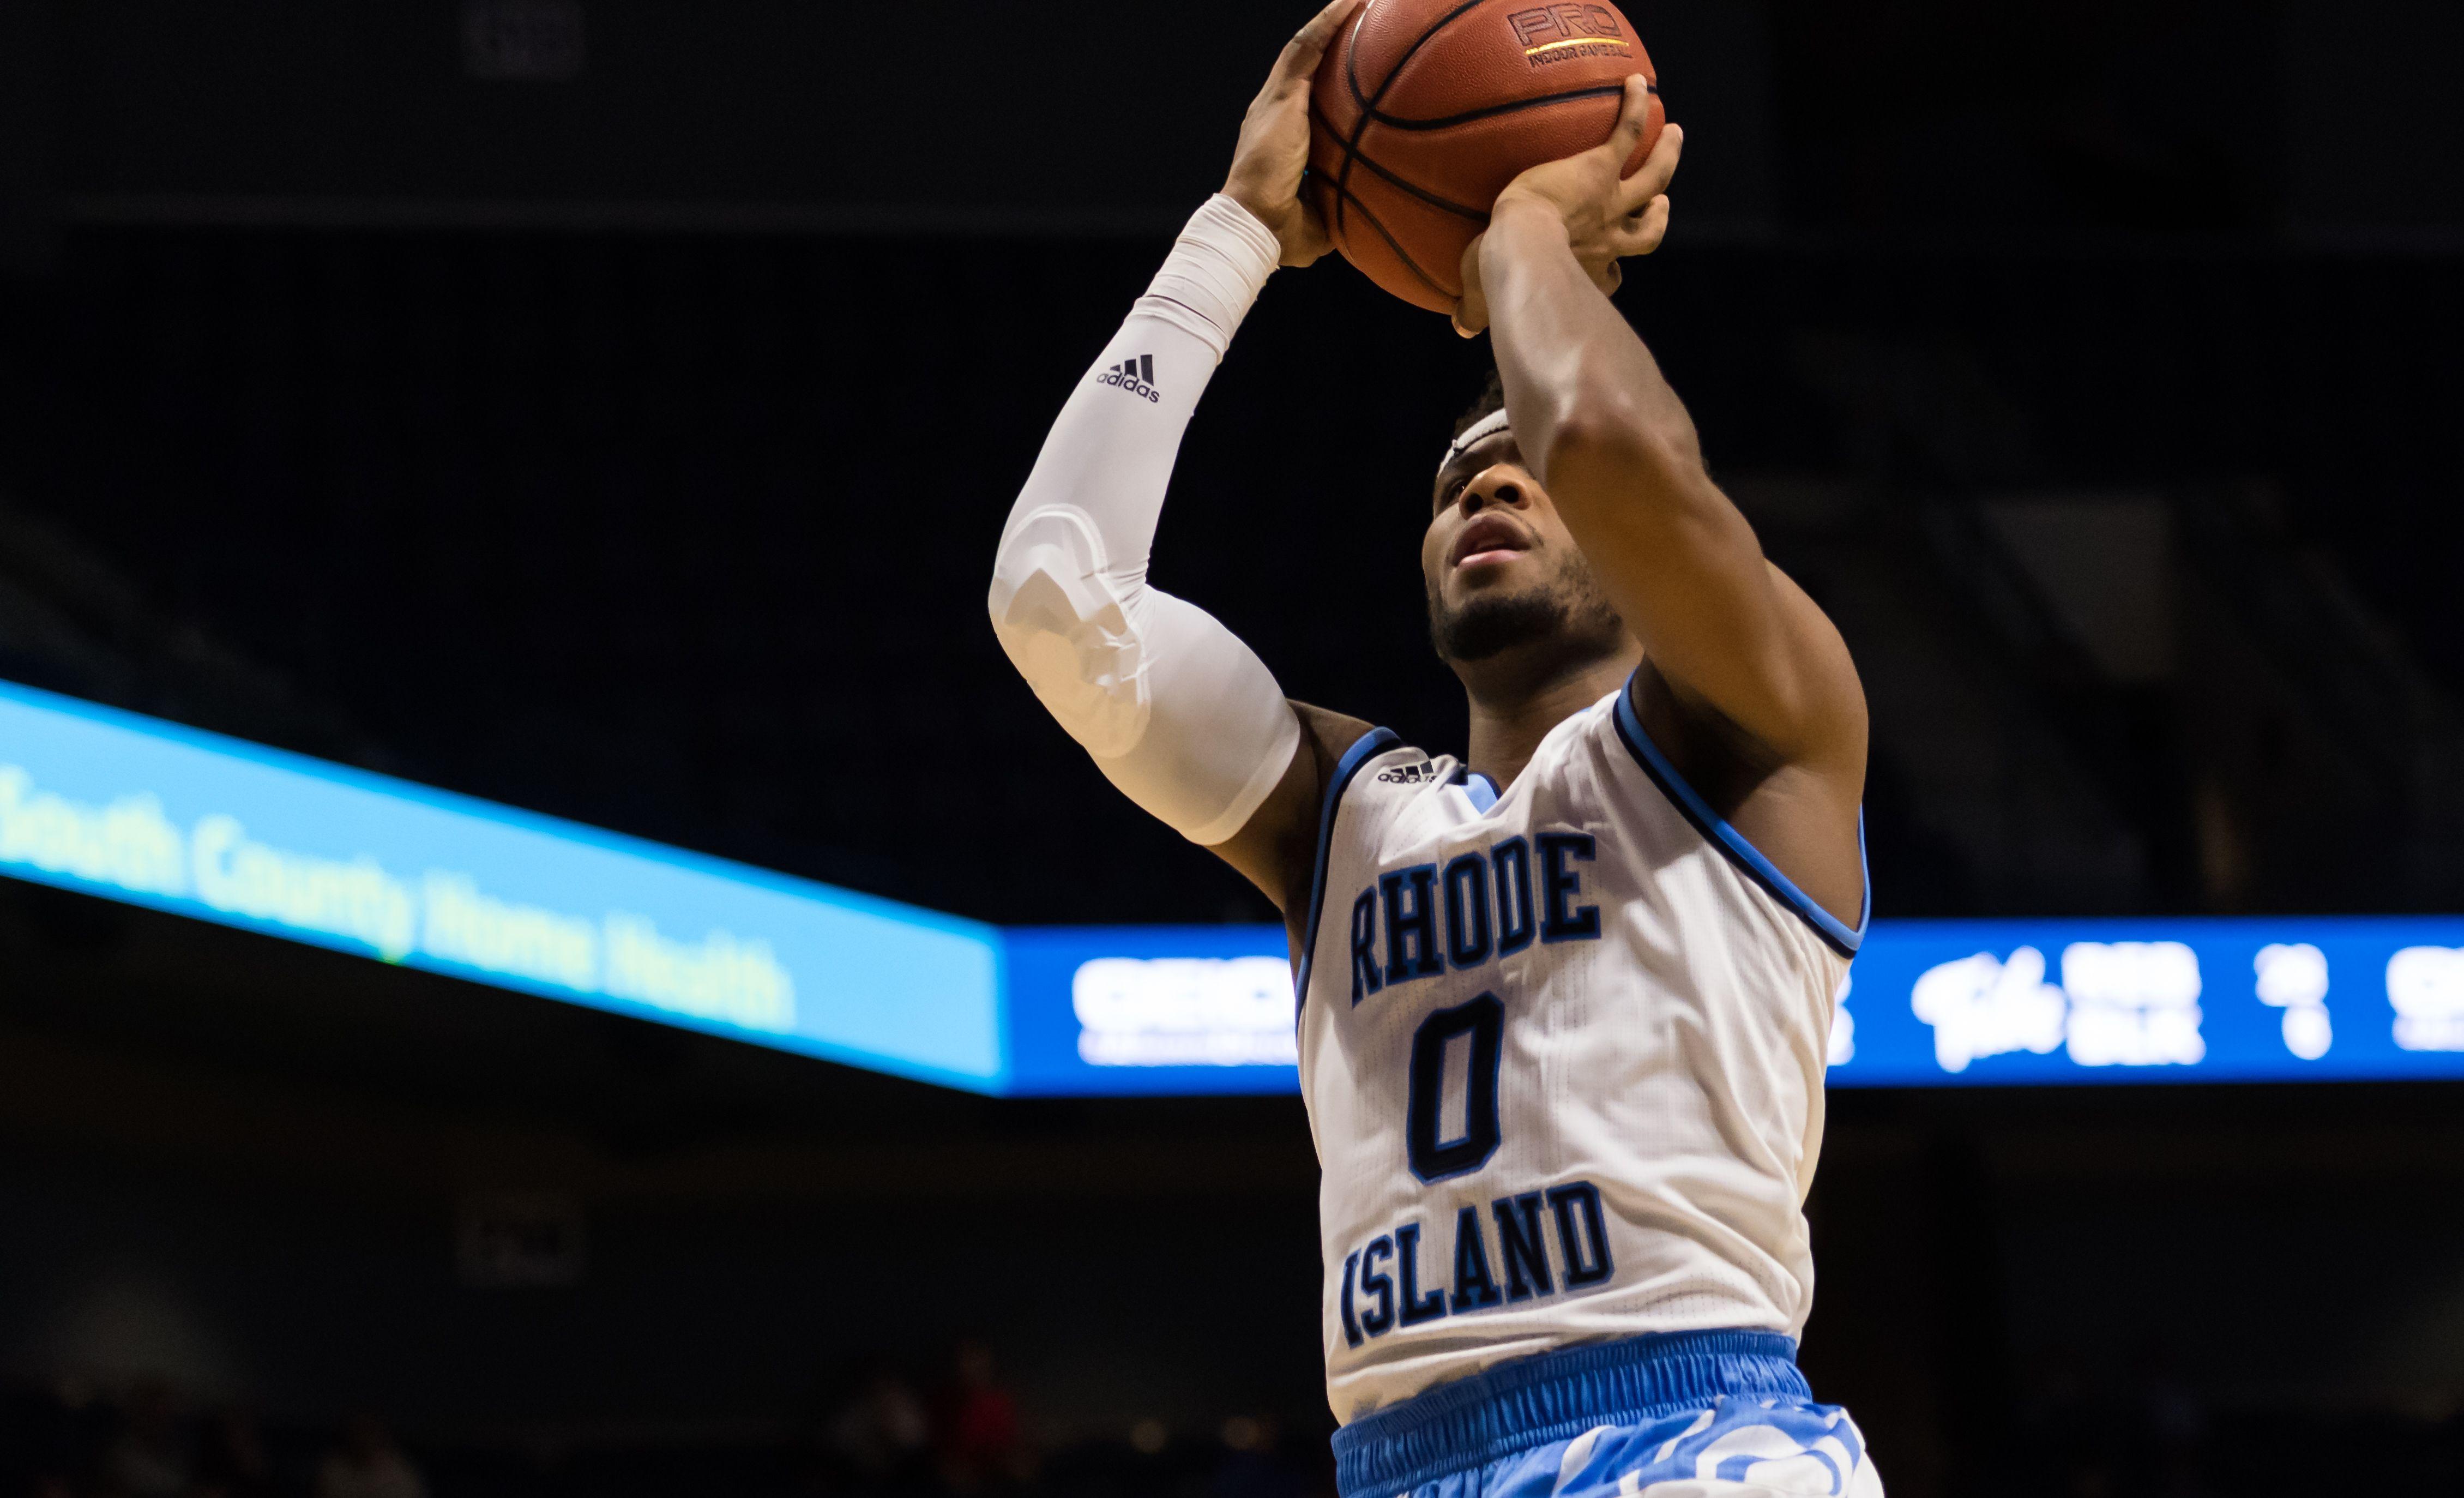 Rhode-island-basketball